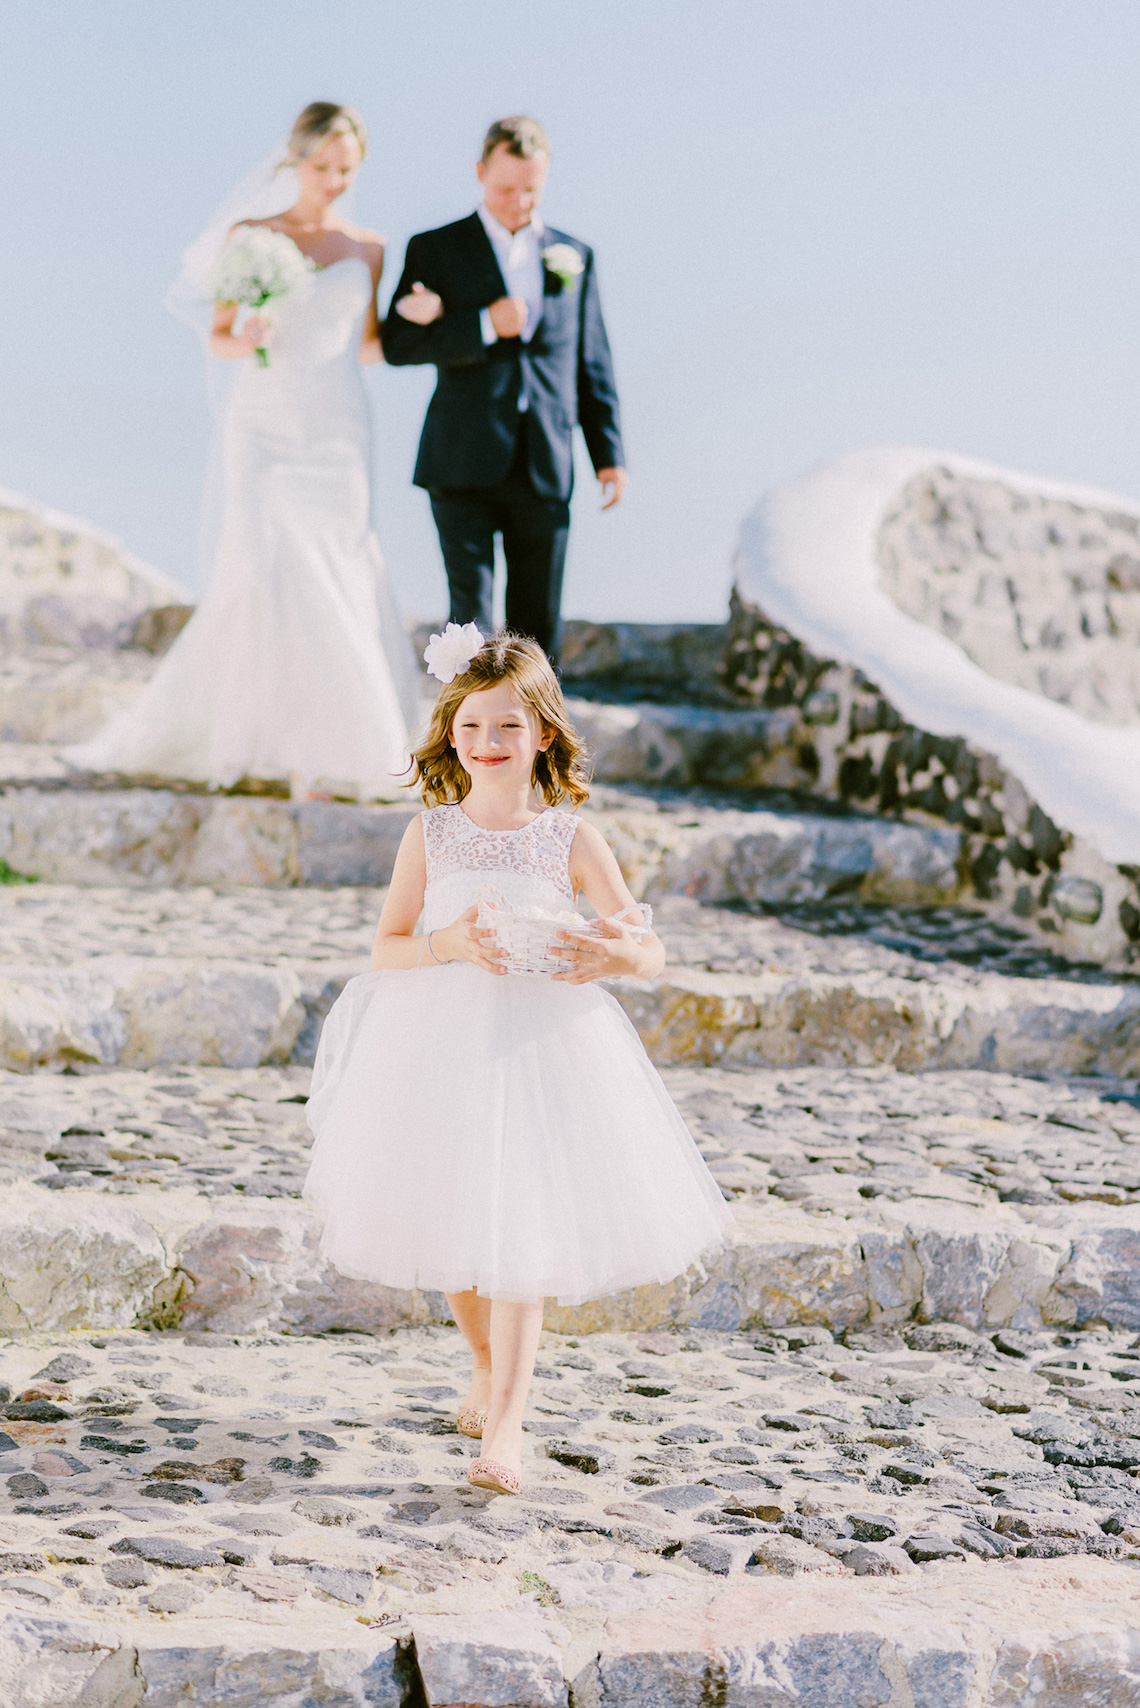 Classy Santorini Destination Wedding (With Amazing Caldera Views!) | Elias Kordelakos 14